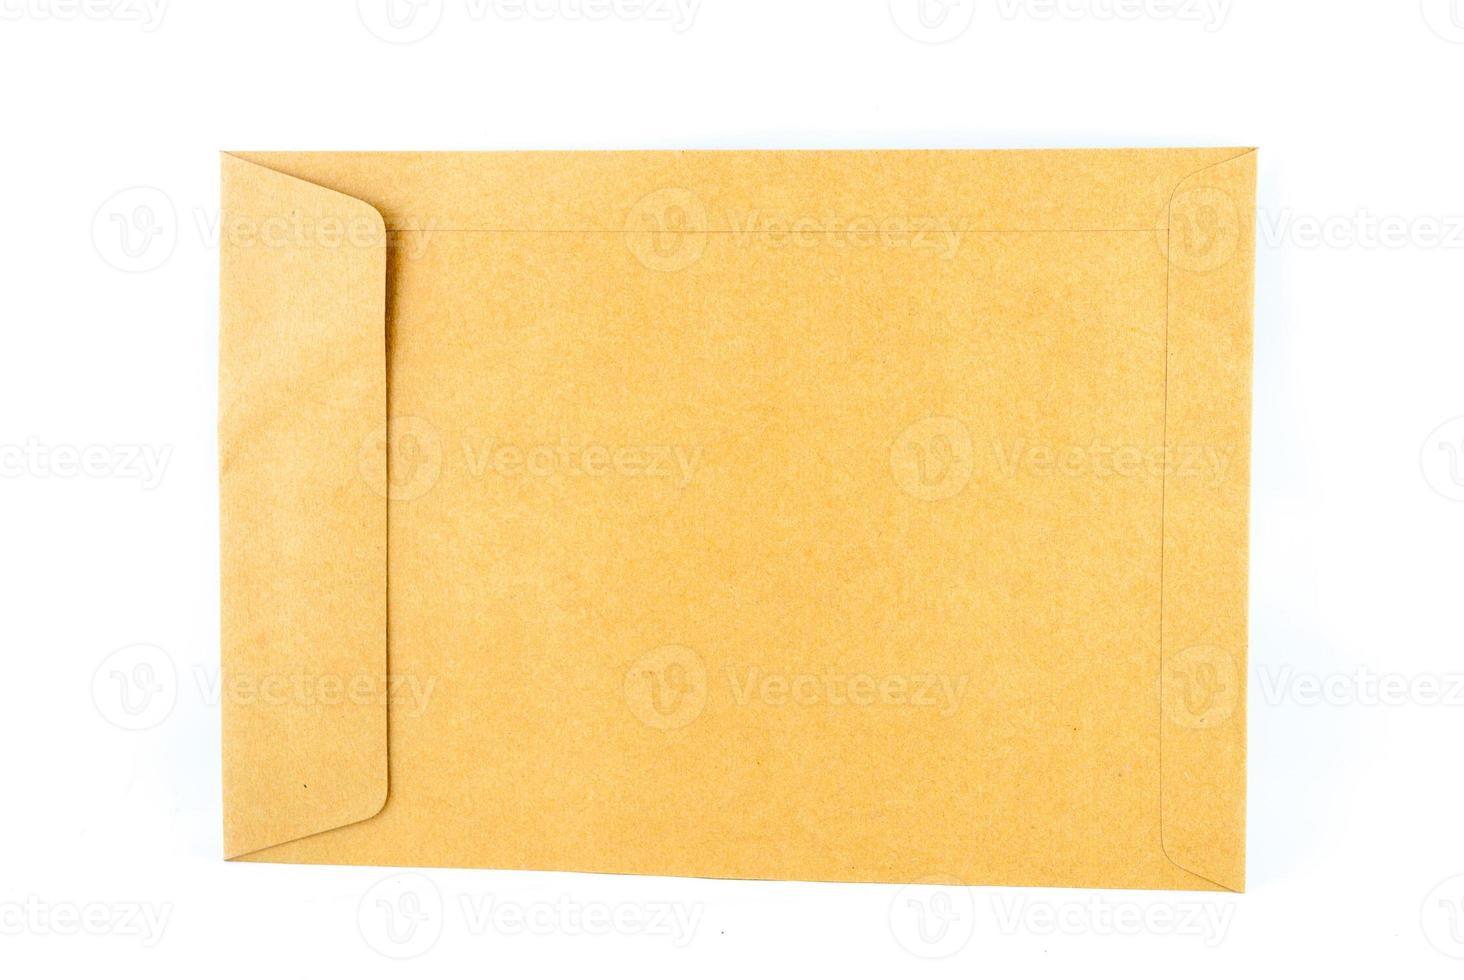 document enveloppe brune photo